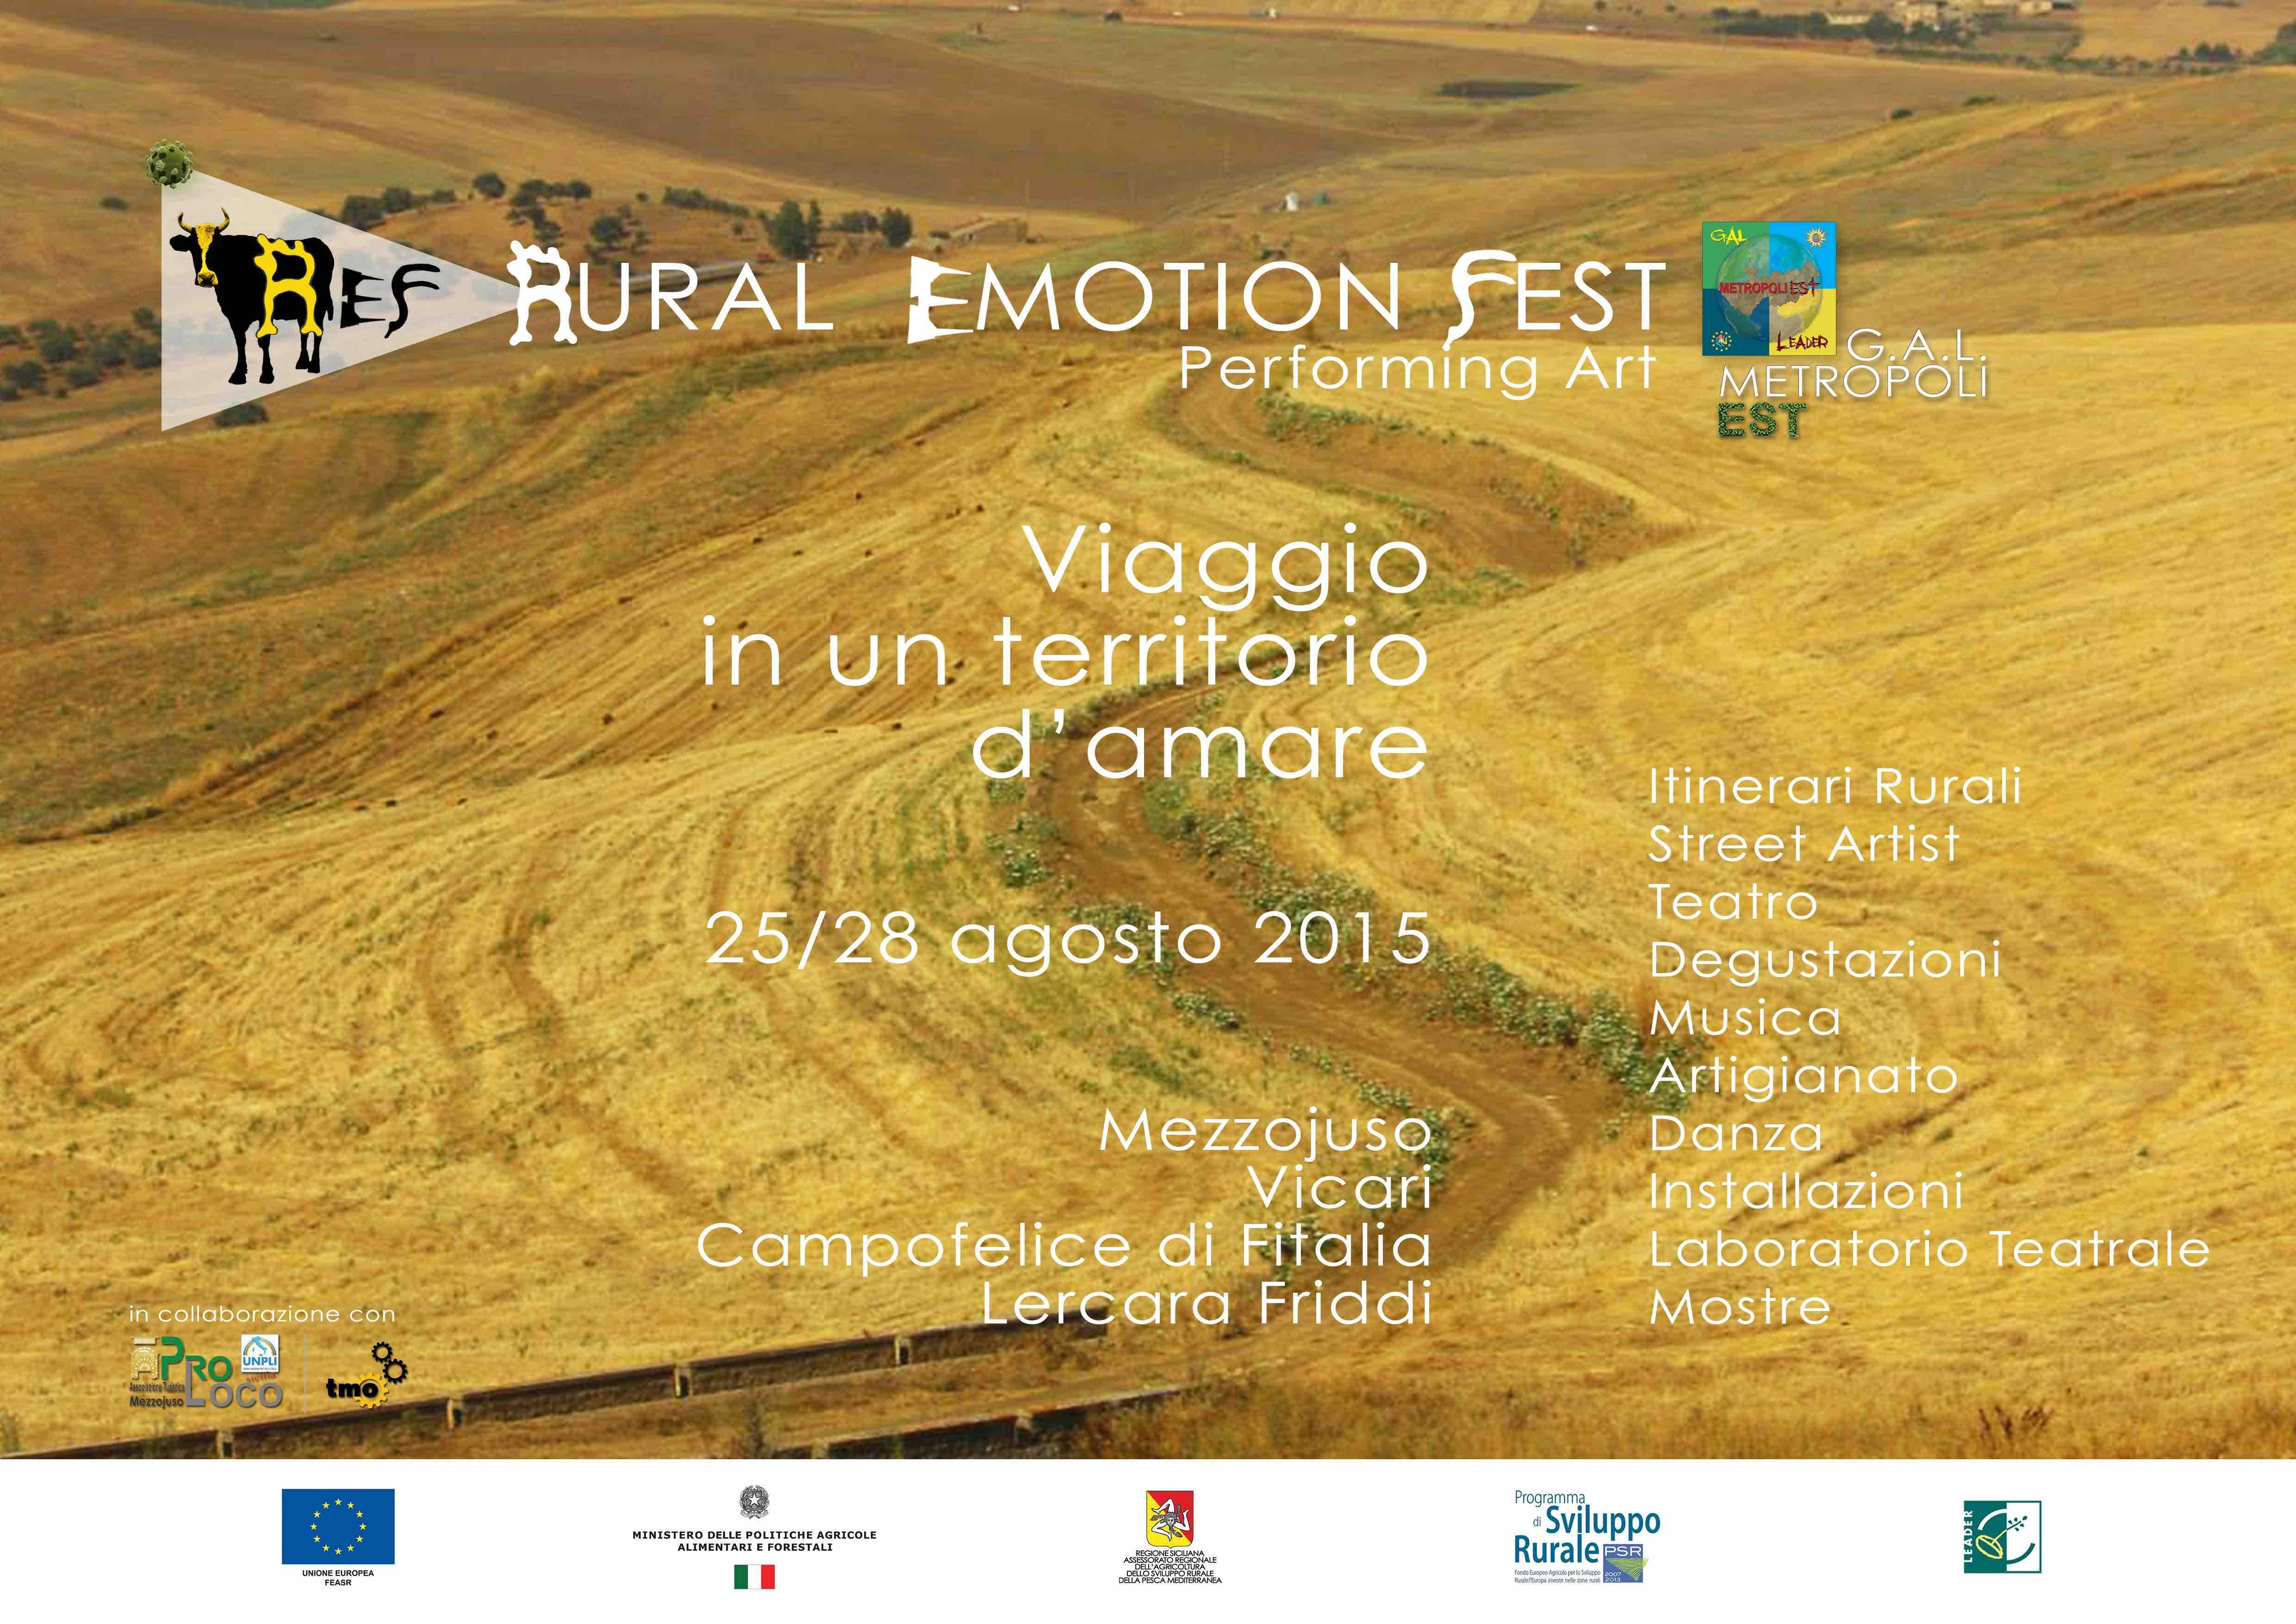 R.E.F. Rural Emotion Fest